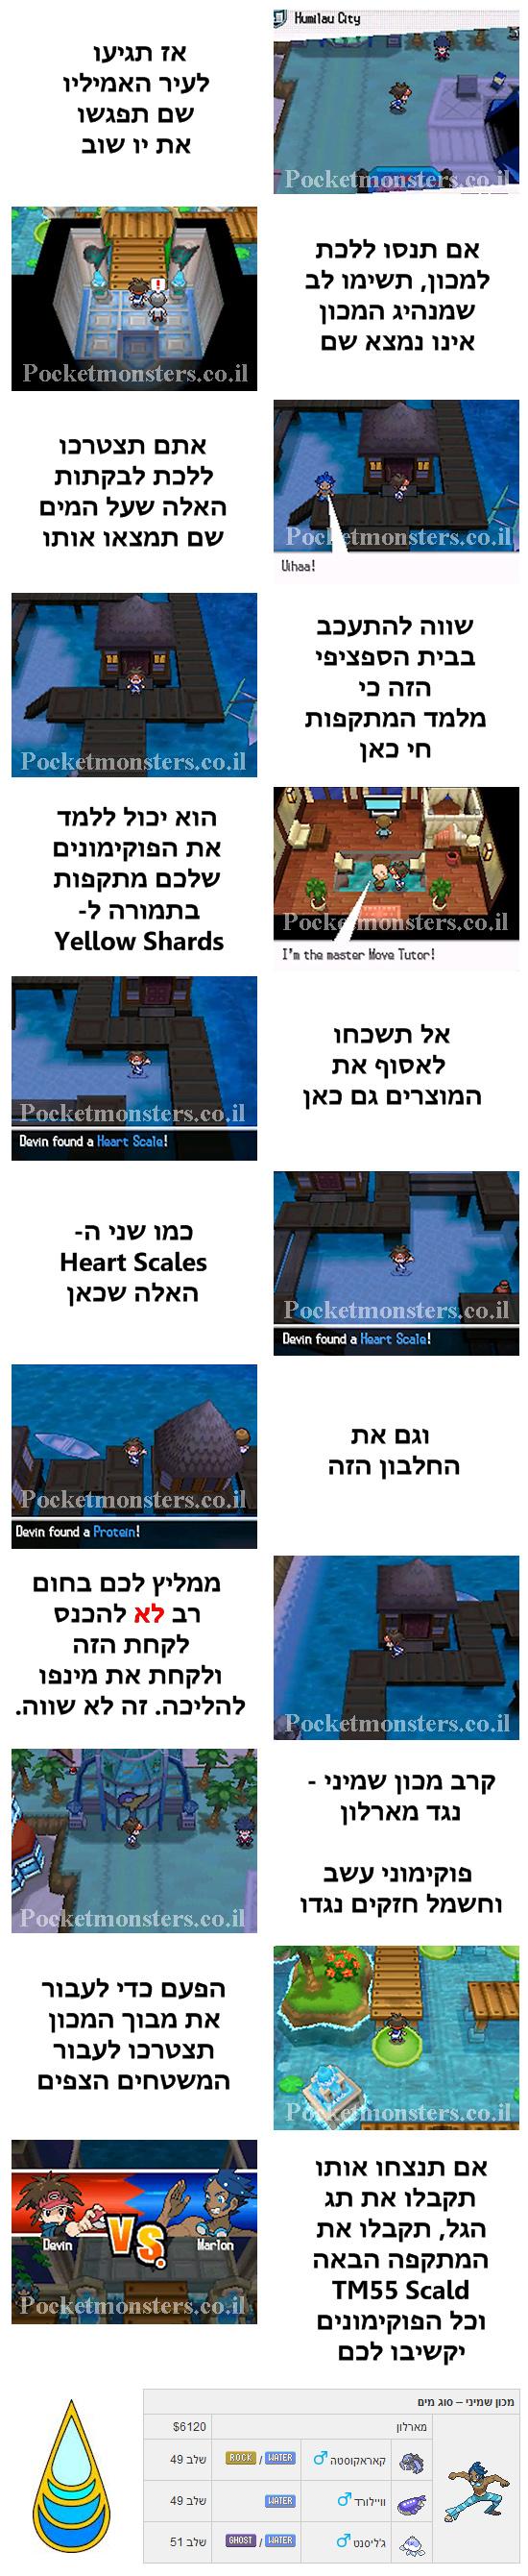 http://pocketmonsters.co.il/wp-content/uploads/2013/08/8.jpg